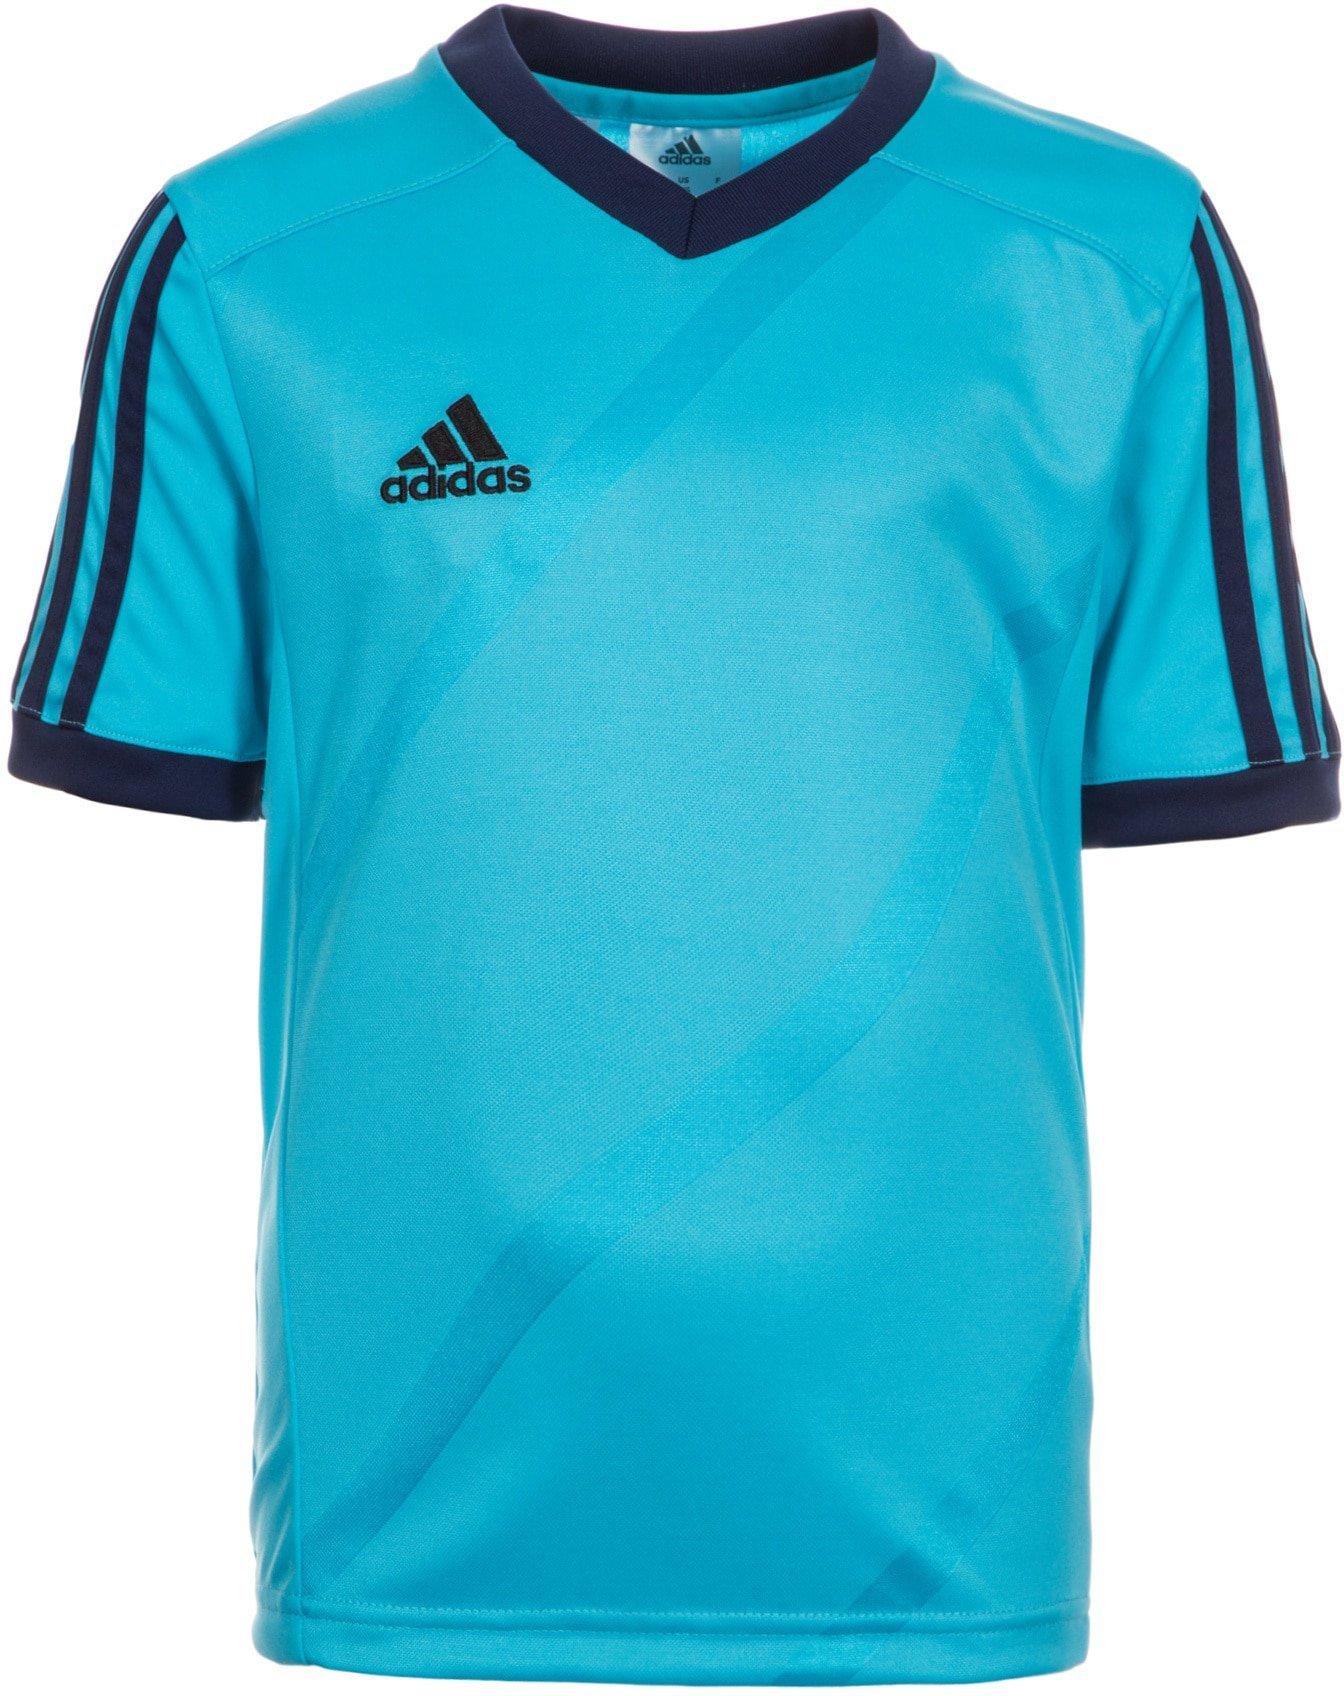 Adidas Tabela 14 Trikot super cyan s12dark blue